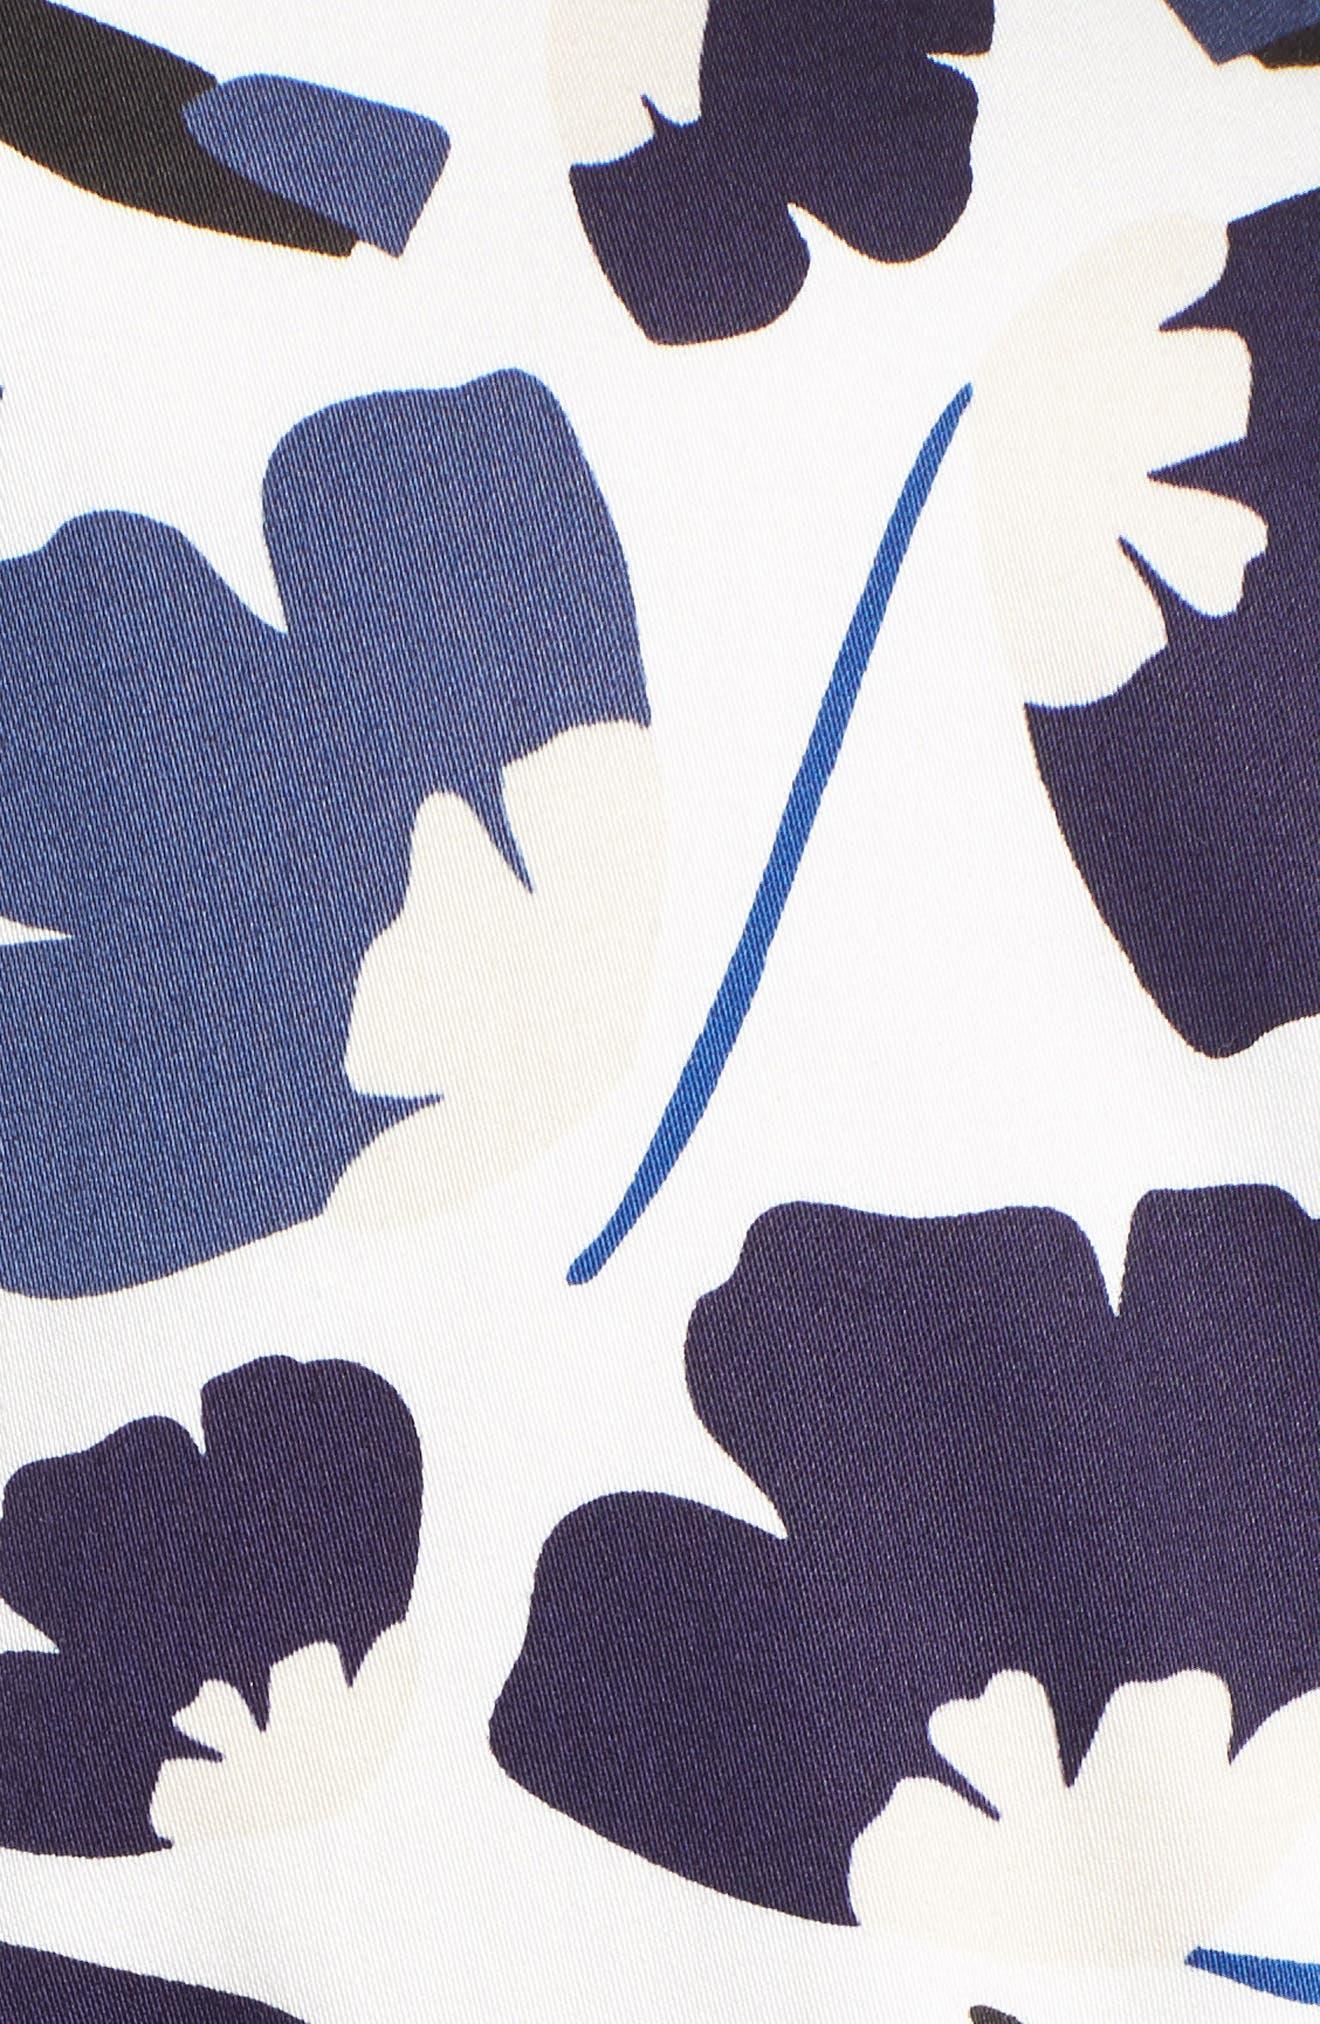 New York Humboldt Cotton Sateen Dress,                             Alternate thumbnail 5, color,                             Monaco Combo